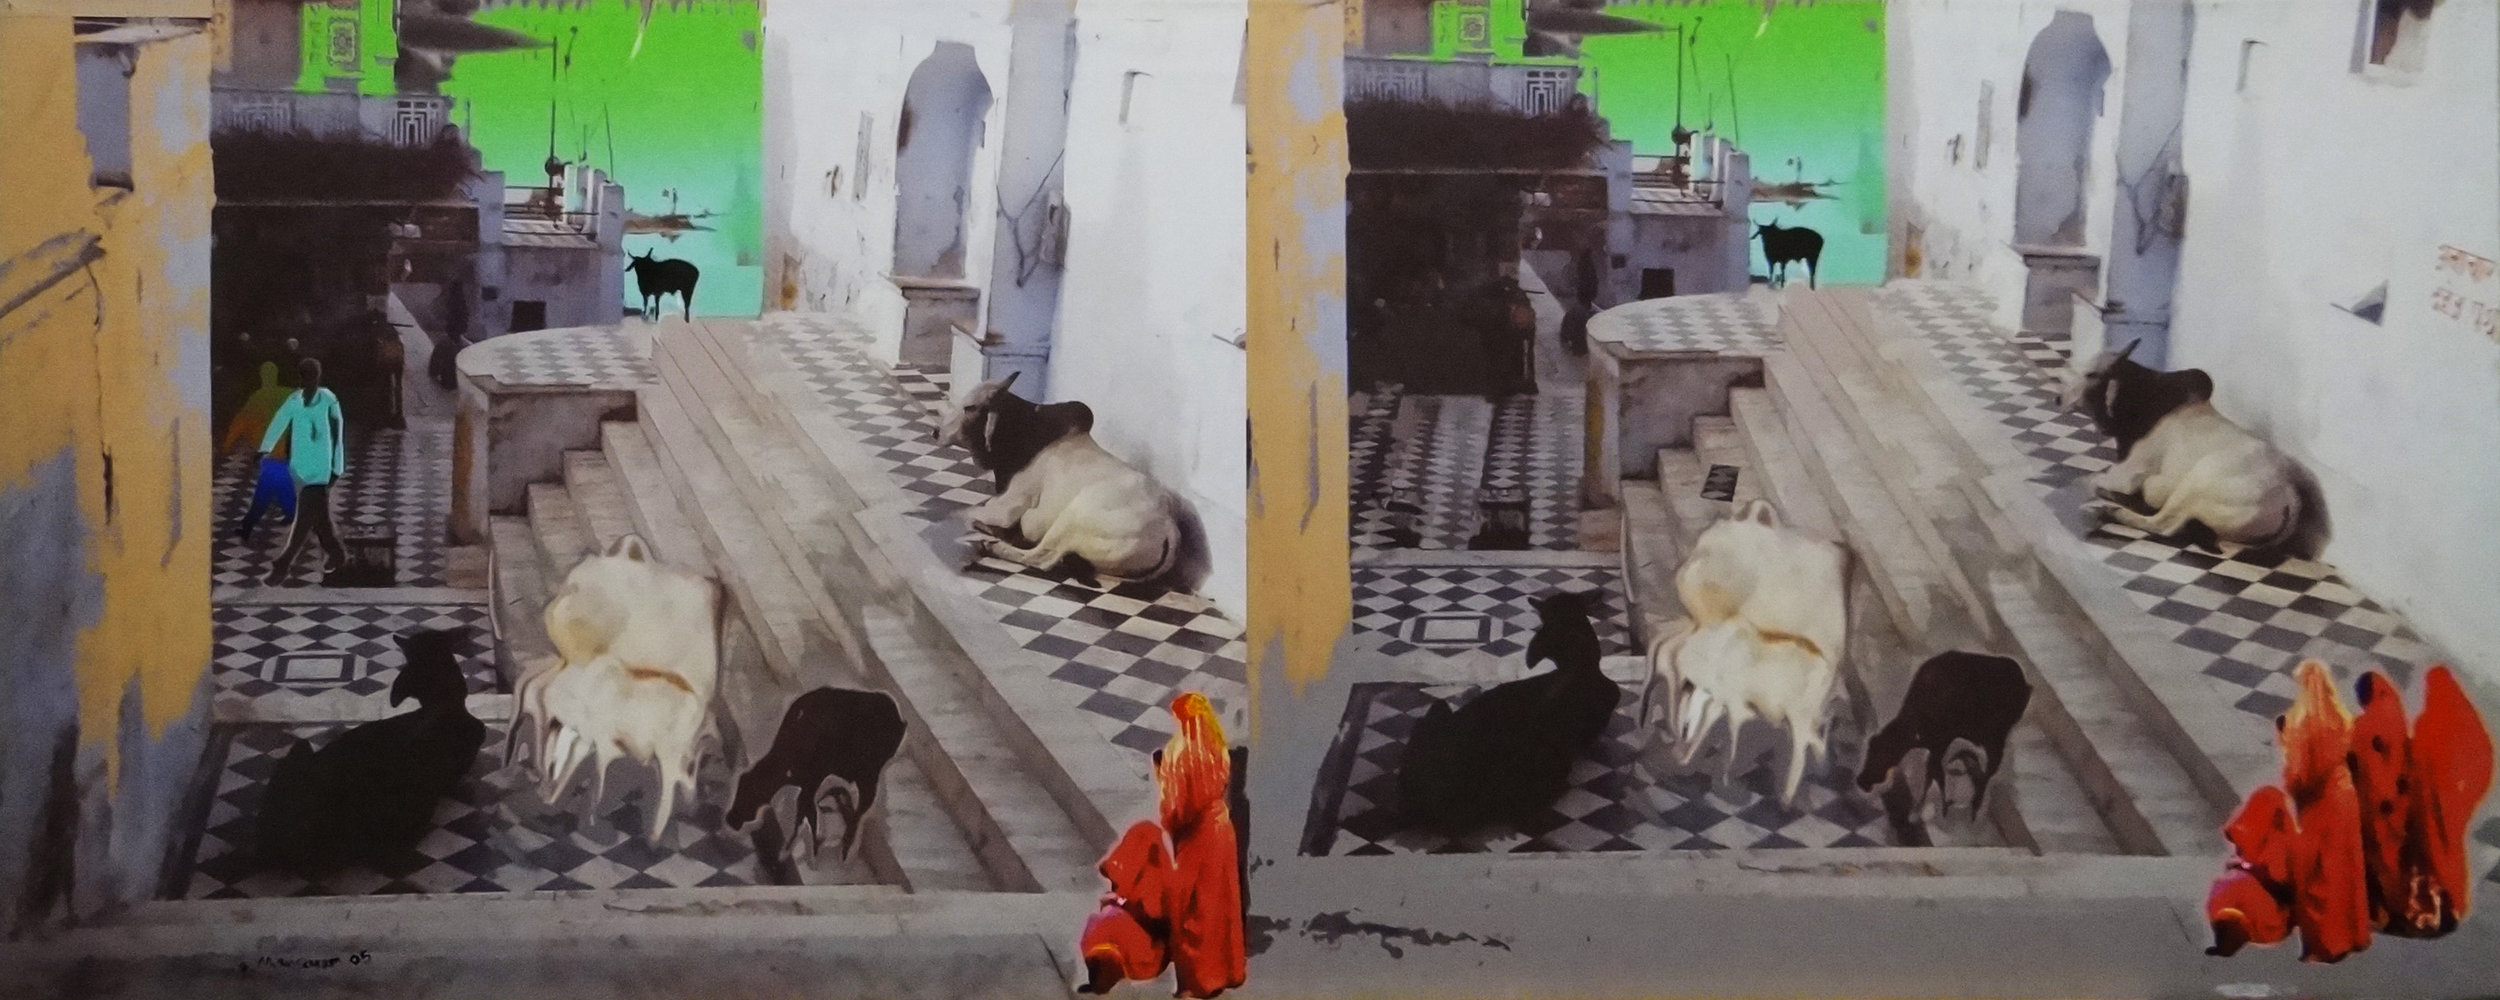 Pushkar , 2005 Mixed media giclee on canvas 51x127 cm